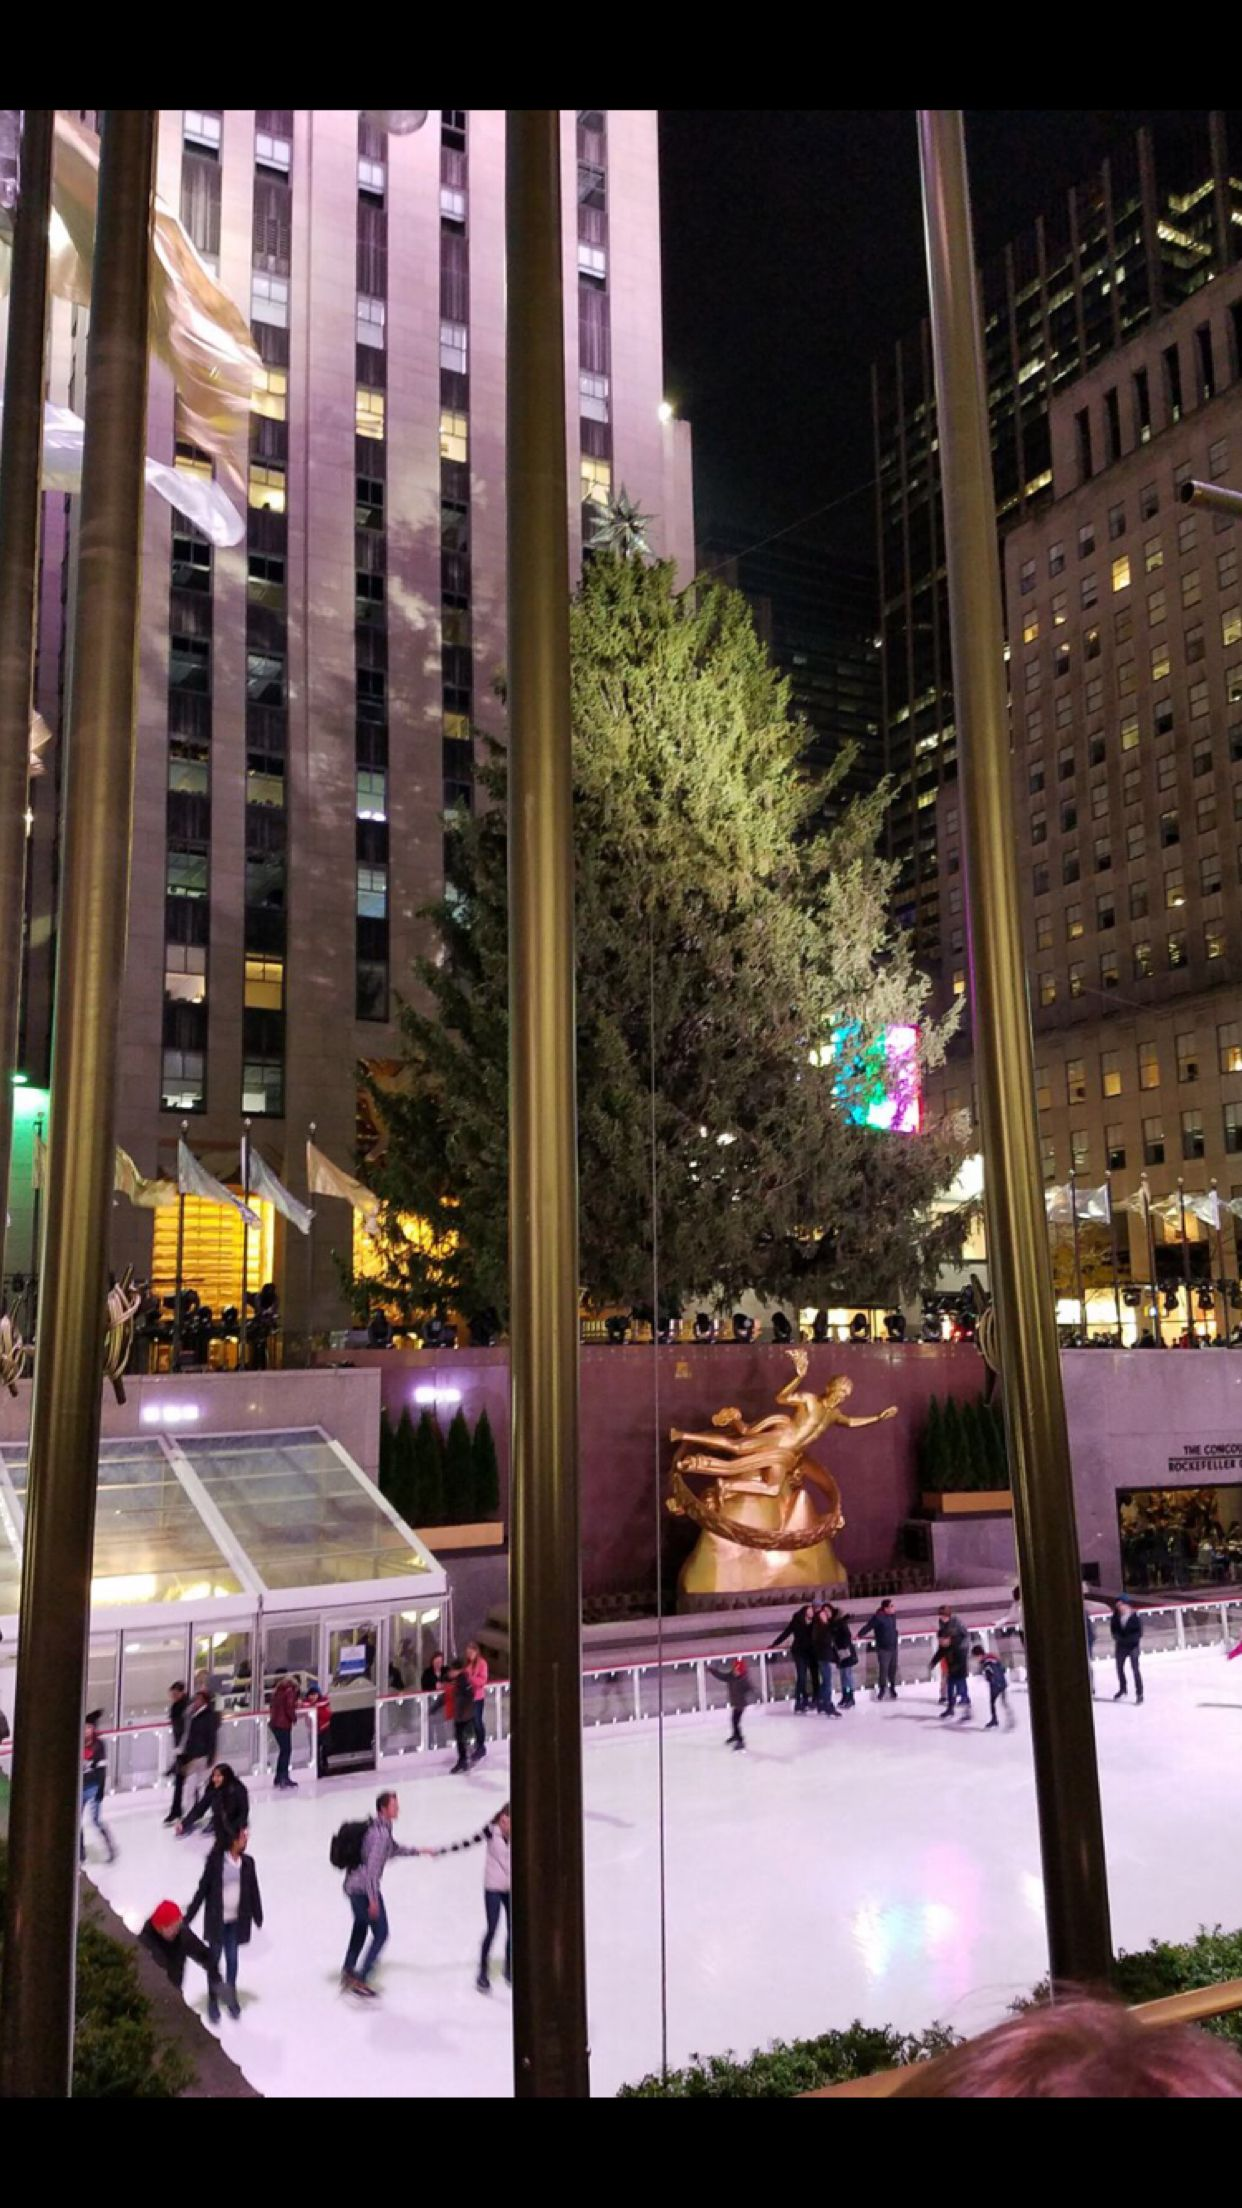 #rockefellercenter #rockefellerchristmastree #rockefellercenter #rockefellerplaza #newyork #NewYork #newyorkcitylife #newyorknewyork ✨